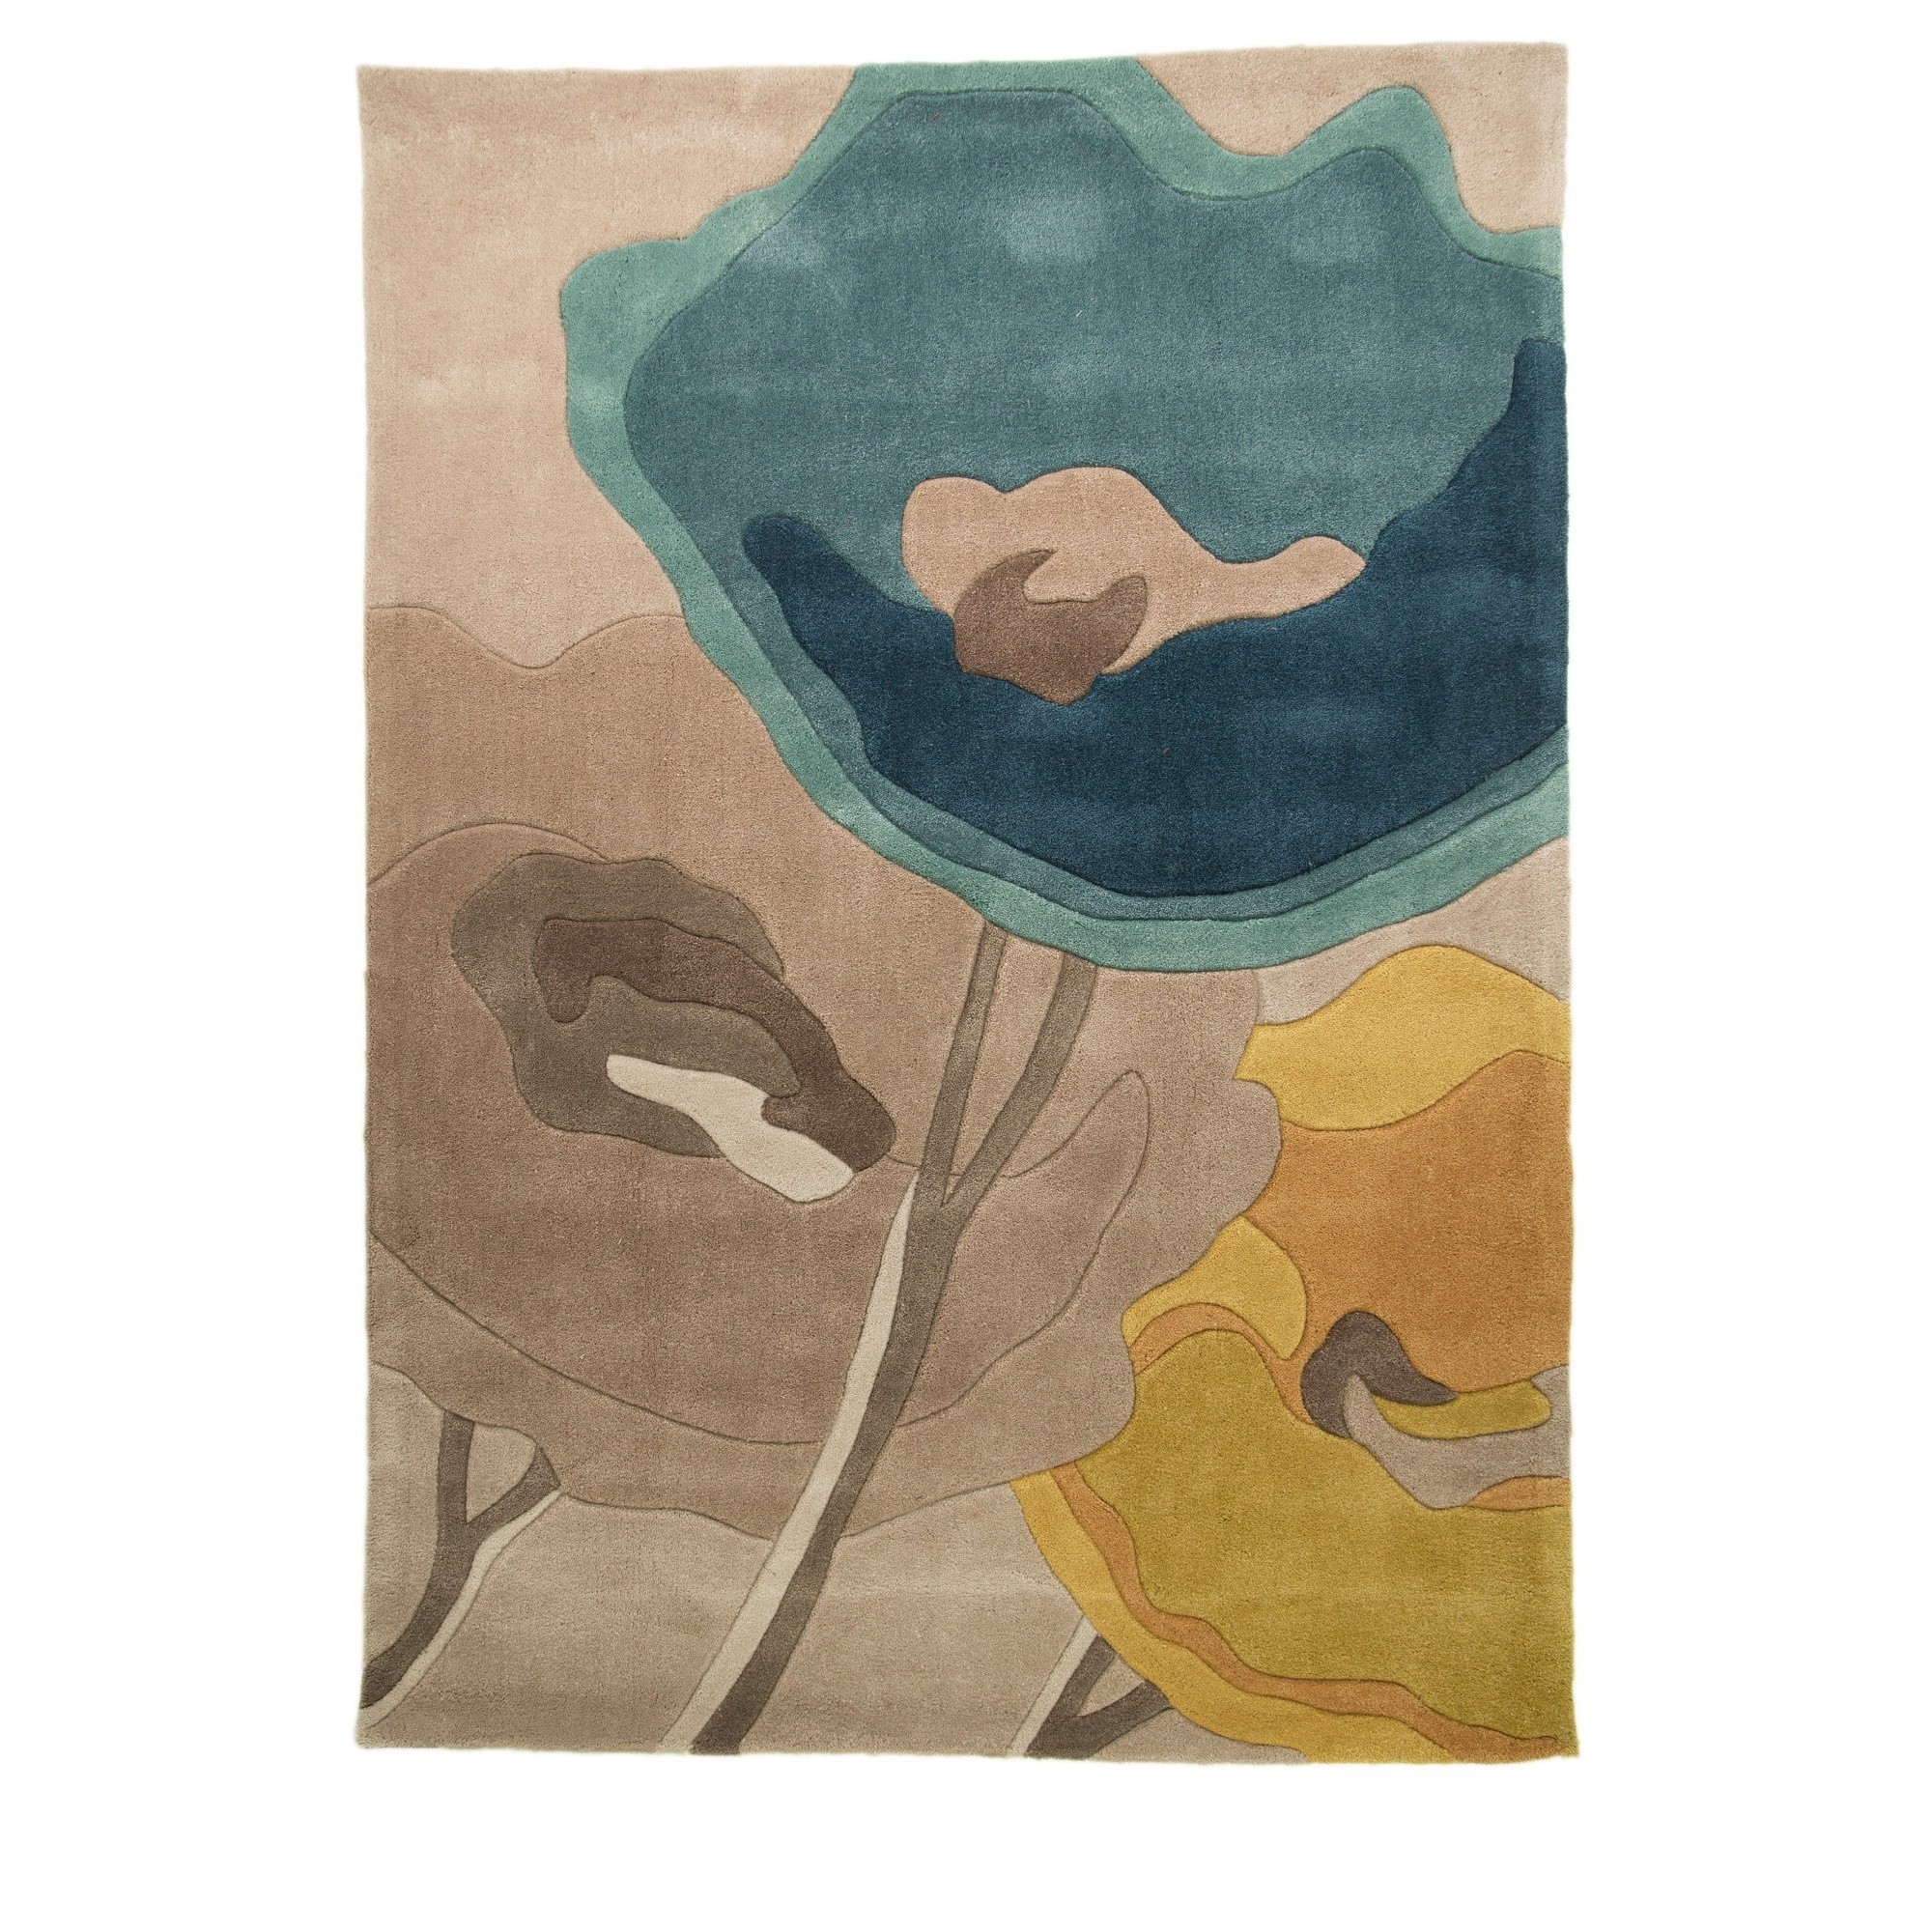 Flair rugs infinite mod art poppy flower design floor rug ebay flair rugs infinite mod art poppy flower design mightylinksfo